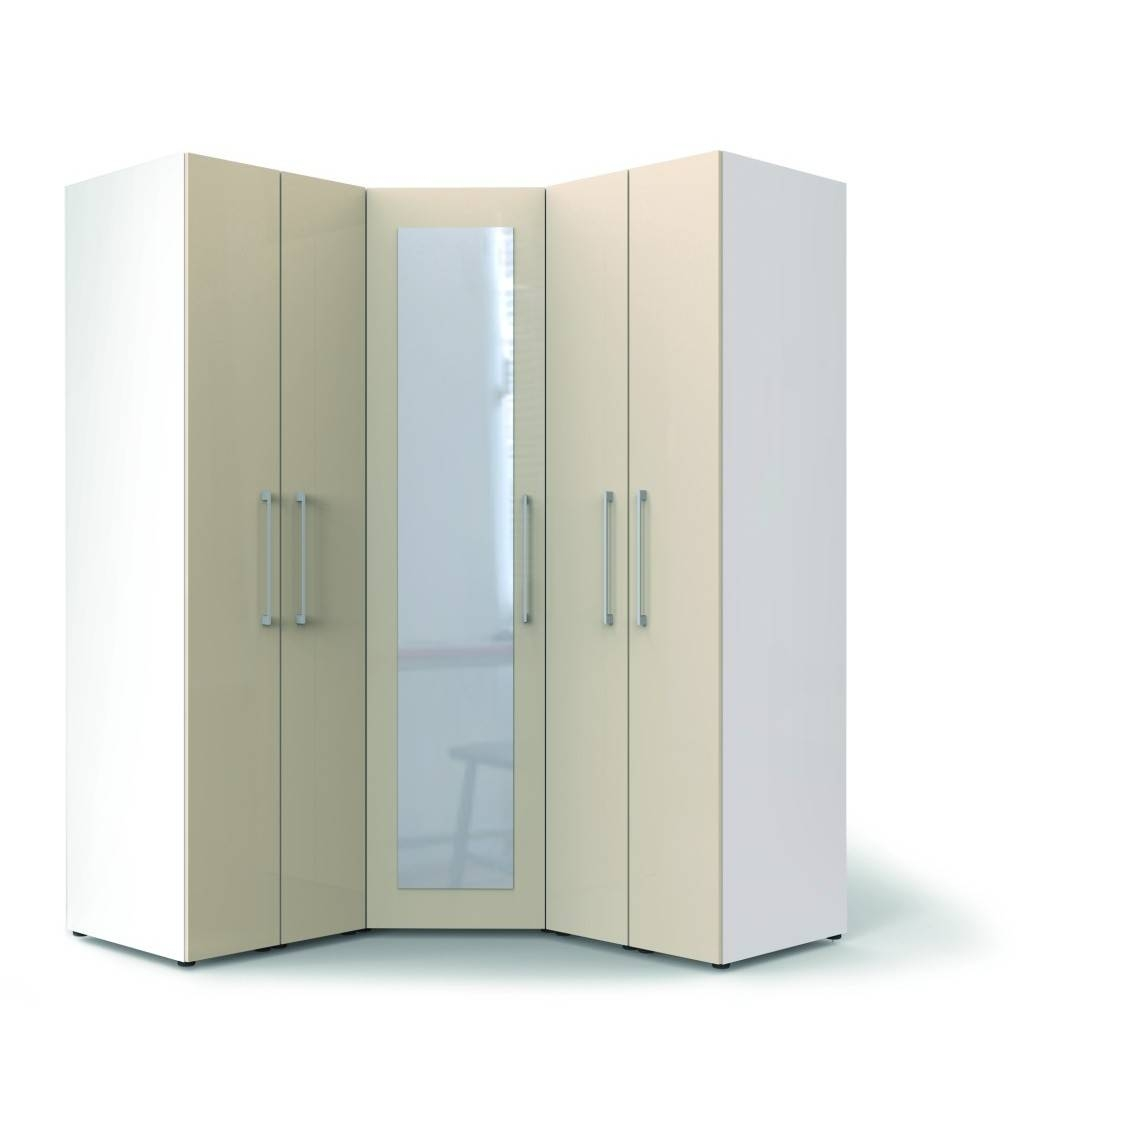 Corner Wardrobe Organization Ideas To Maximize The Empty Spot pertaining to White Corner Wardrobes Units (Image 4 of 15)